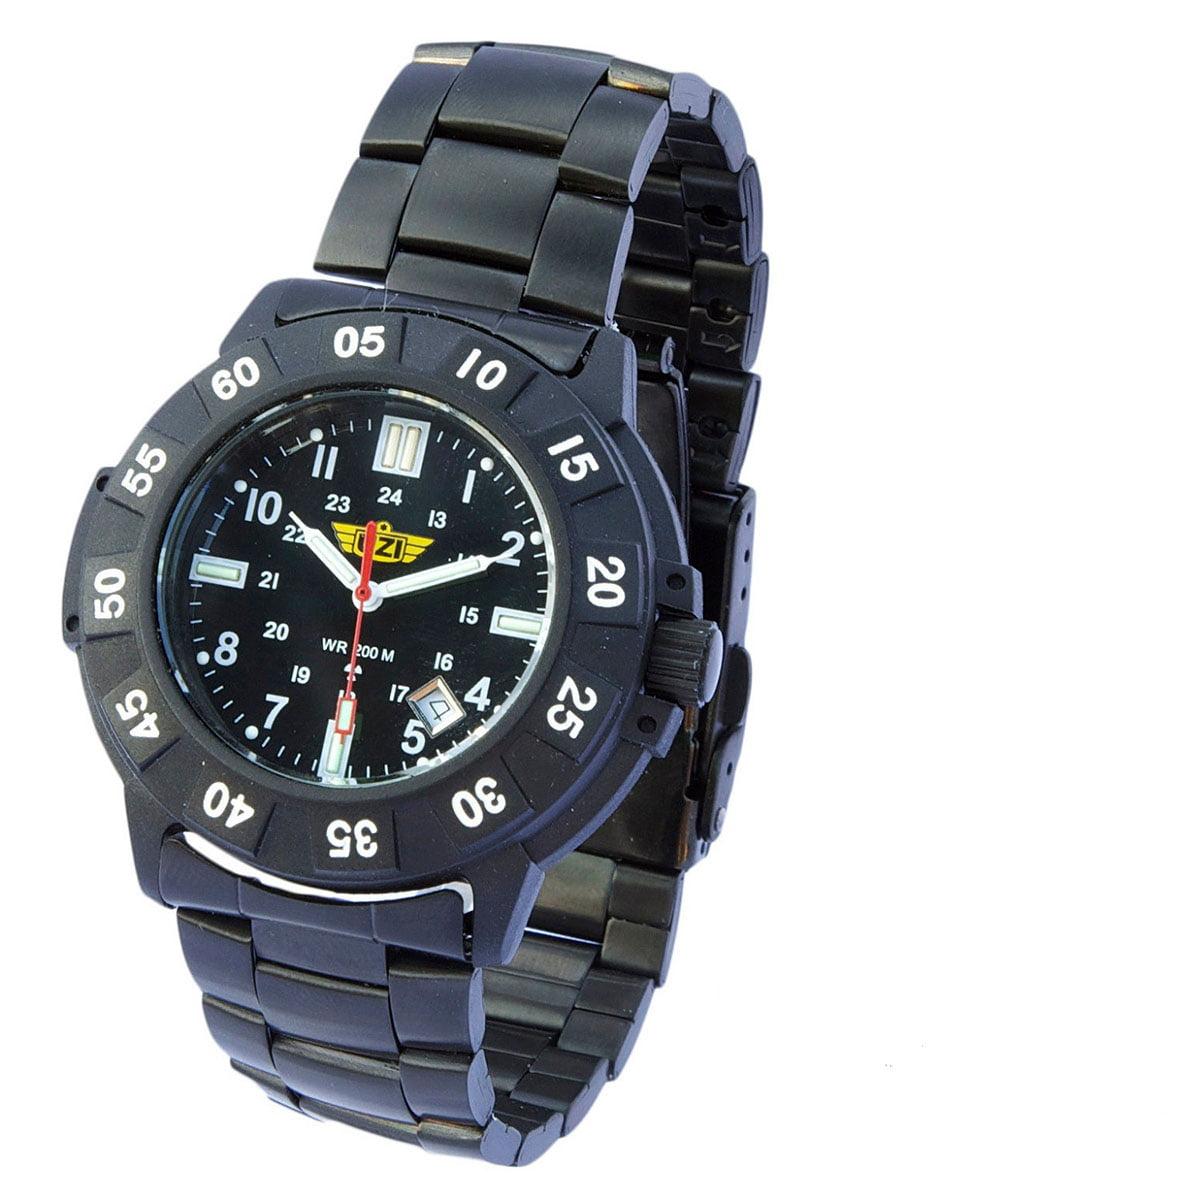 UZI  Protector Tritium H3 Watch with Metal Strap - Black - UZI-001-M